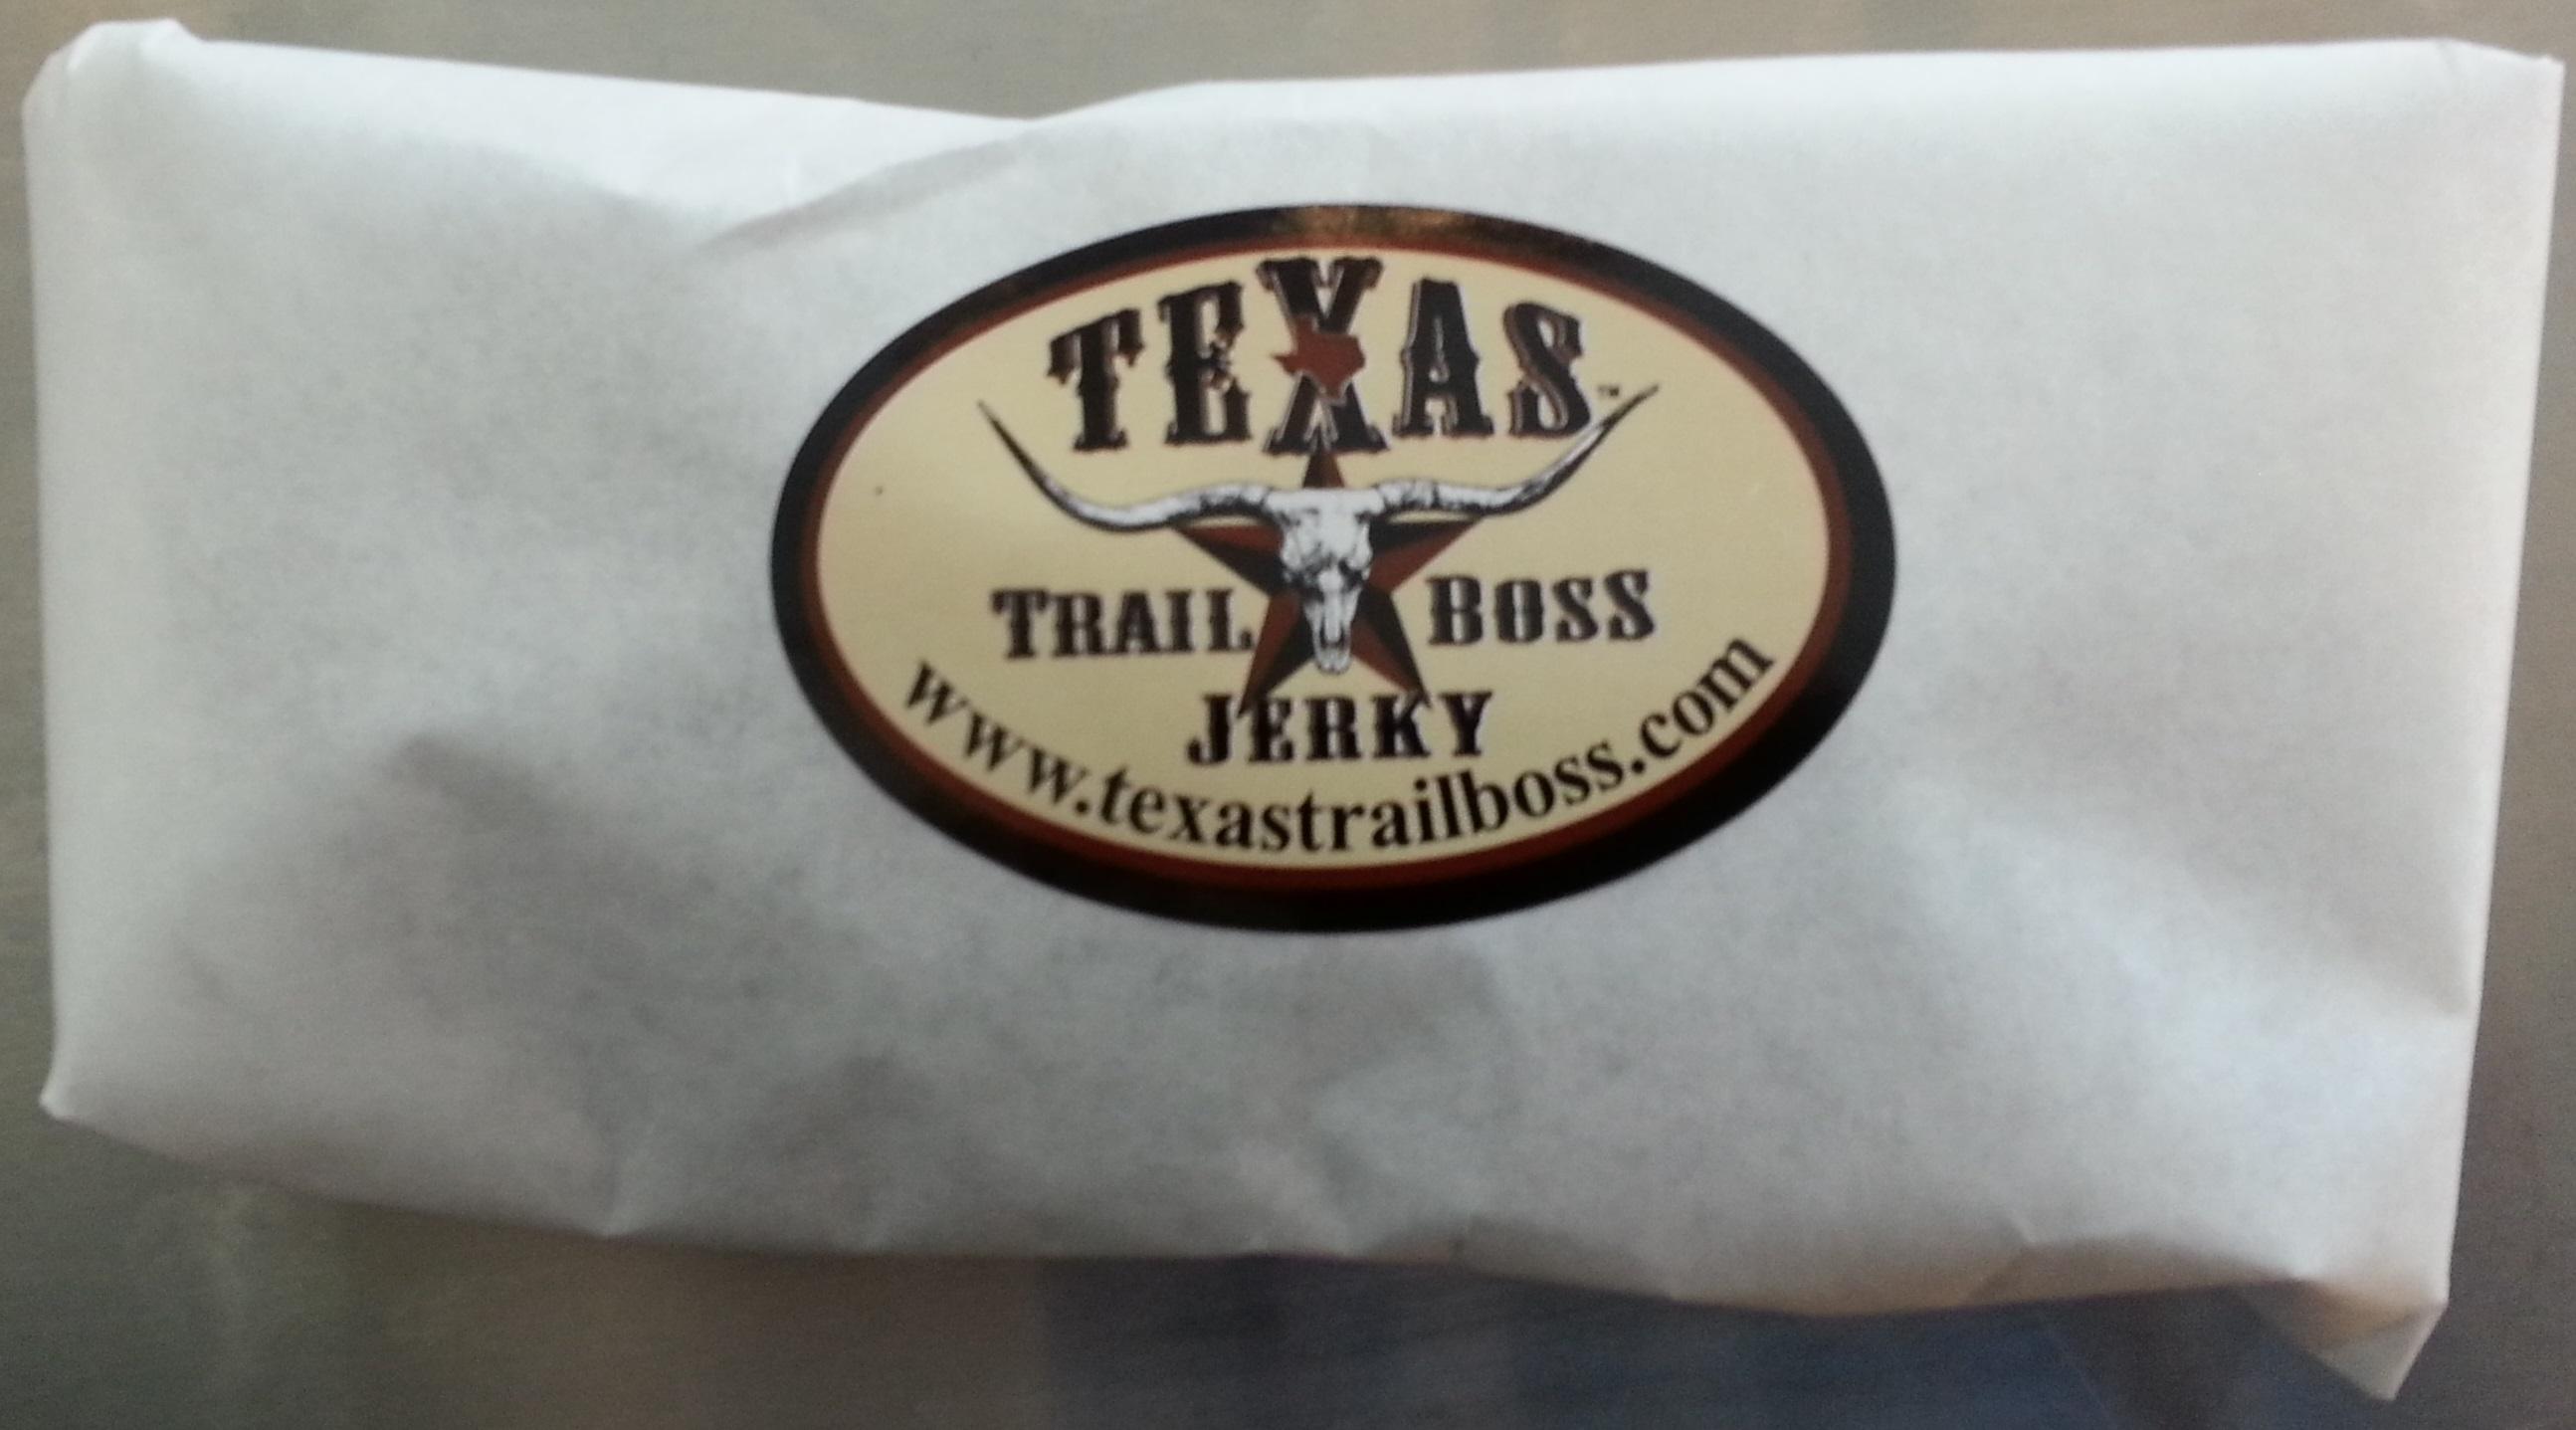 Texas Trail Boss Teriyaki Beef Jerky